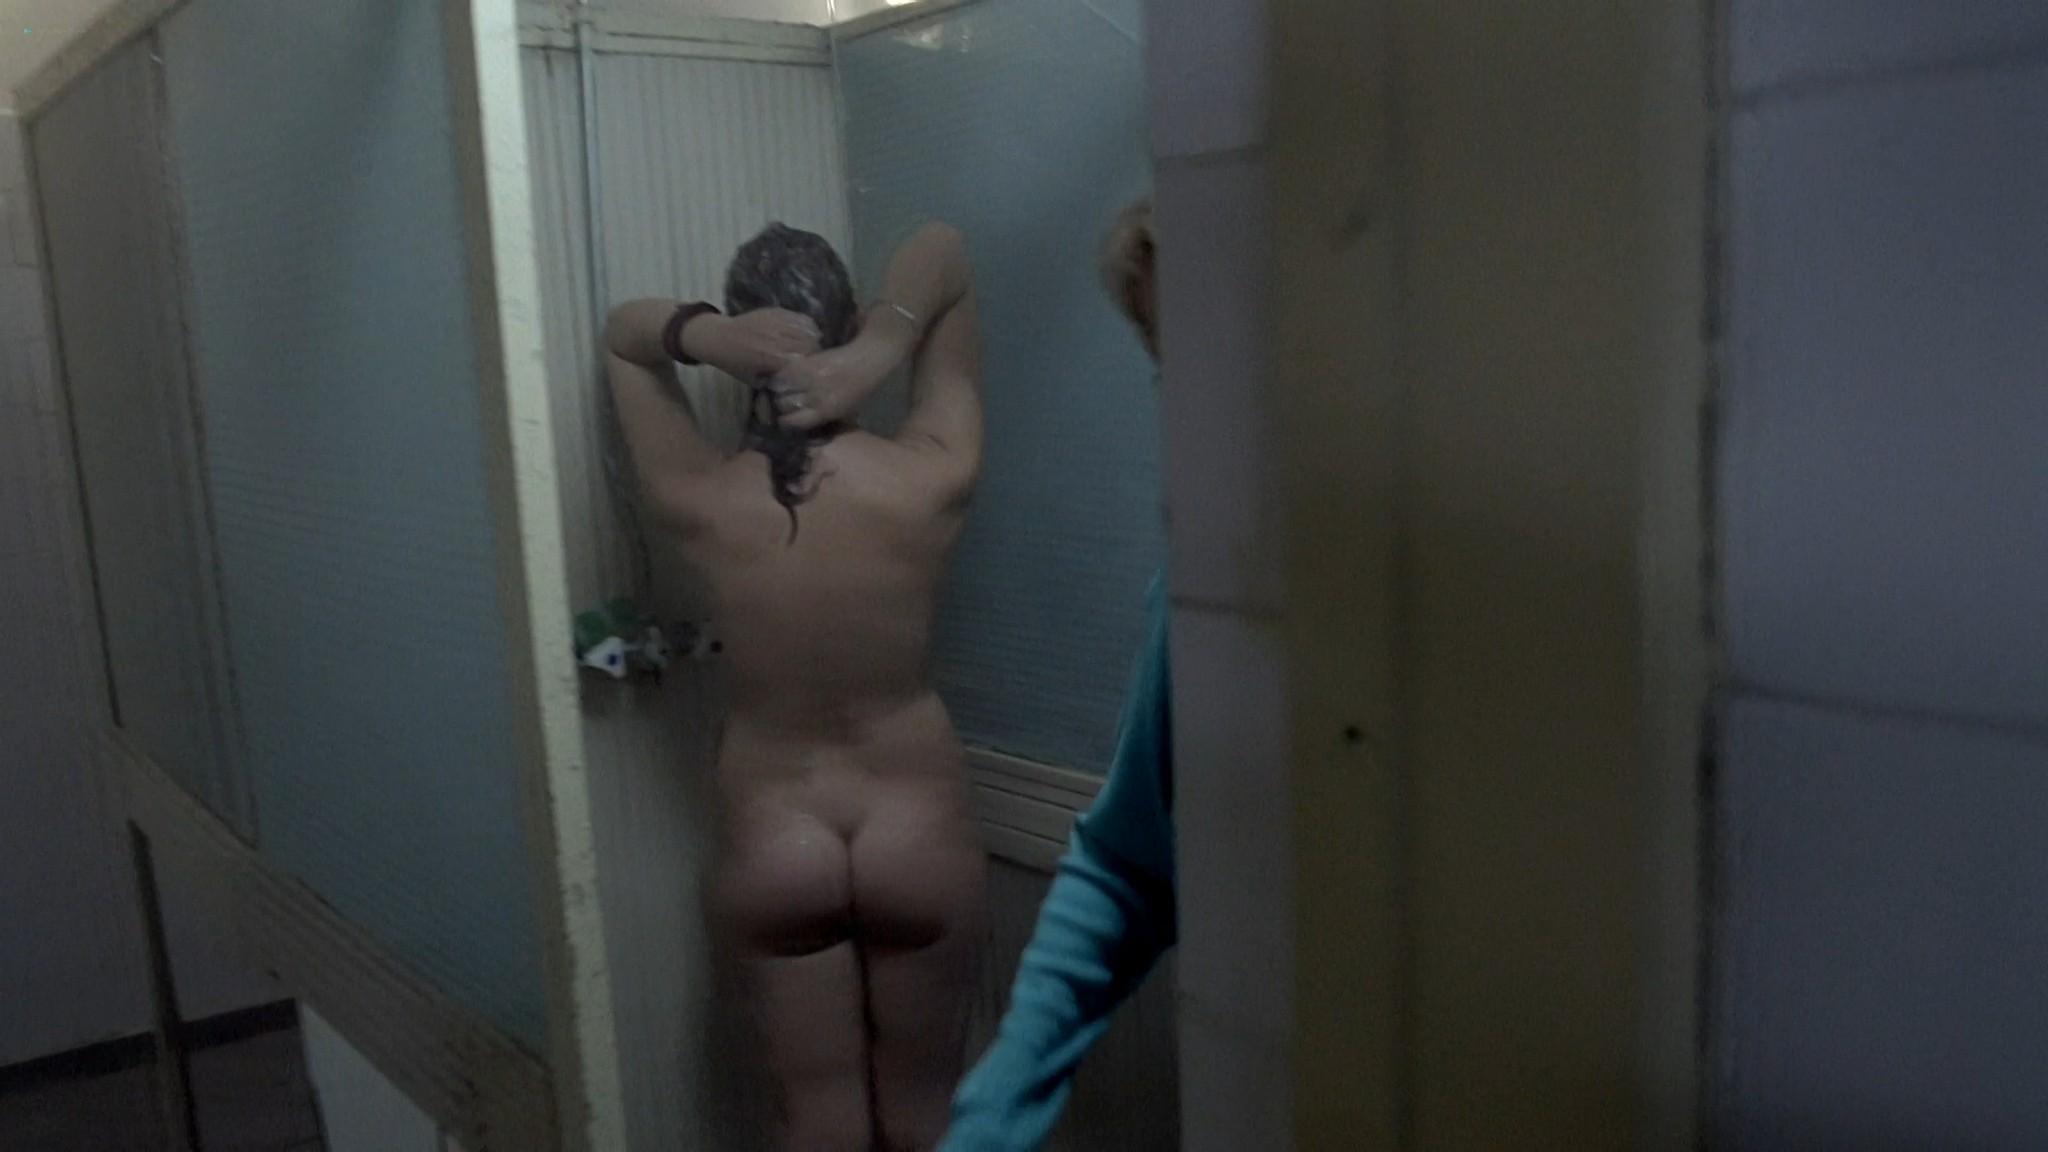 Laura Vasiliu nude bush Anamaria Marinca nude too 4 Months 3 Weeks and 2 Days RO 2007 1080p BluRay 003